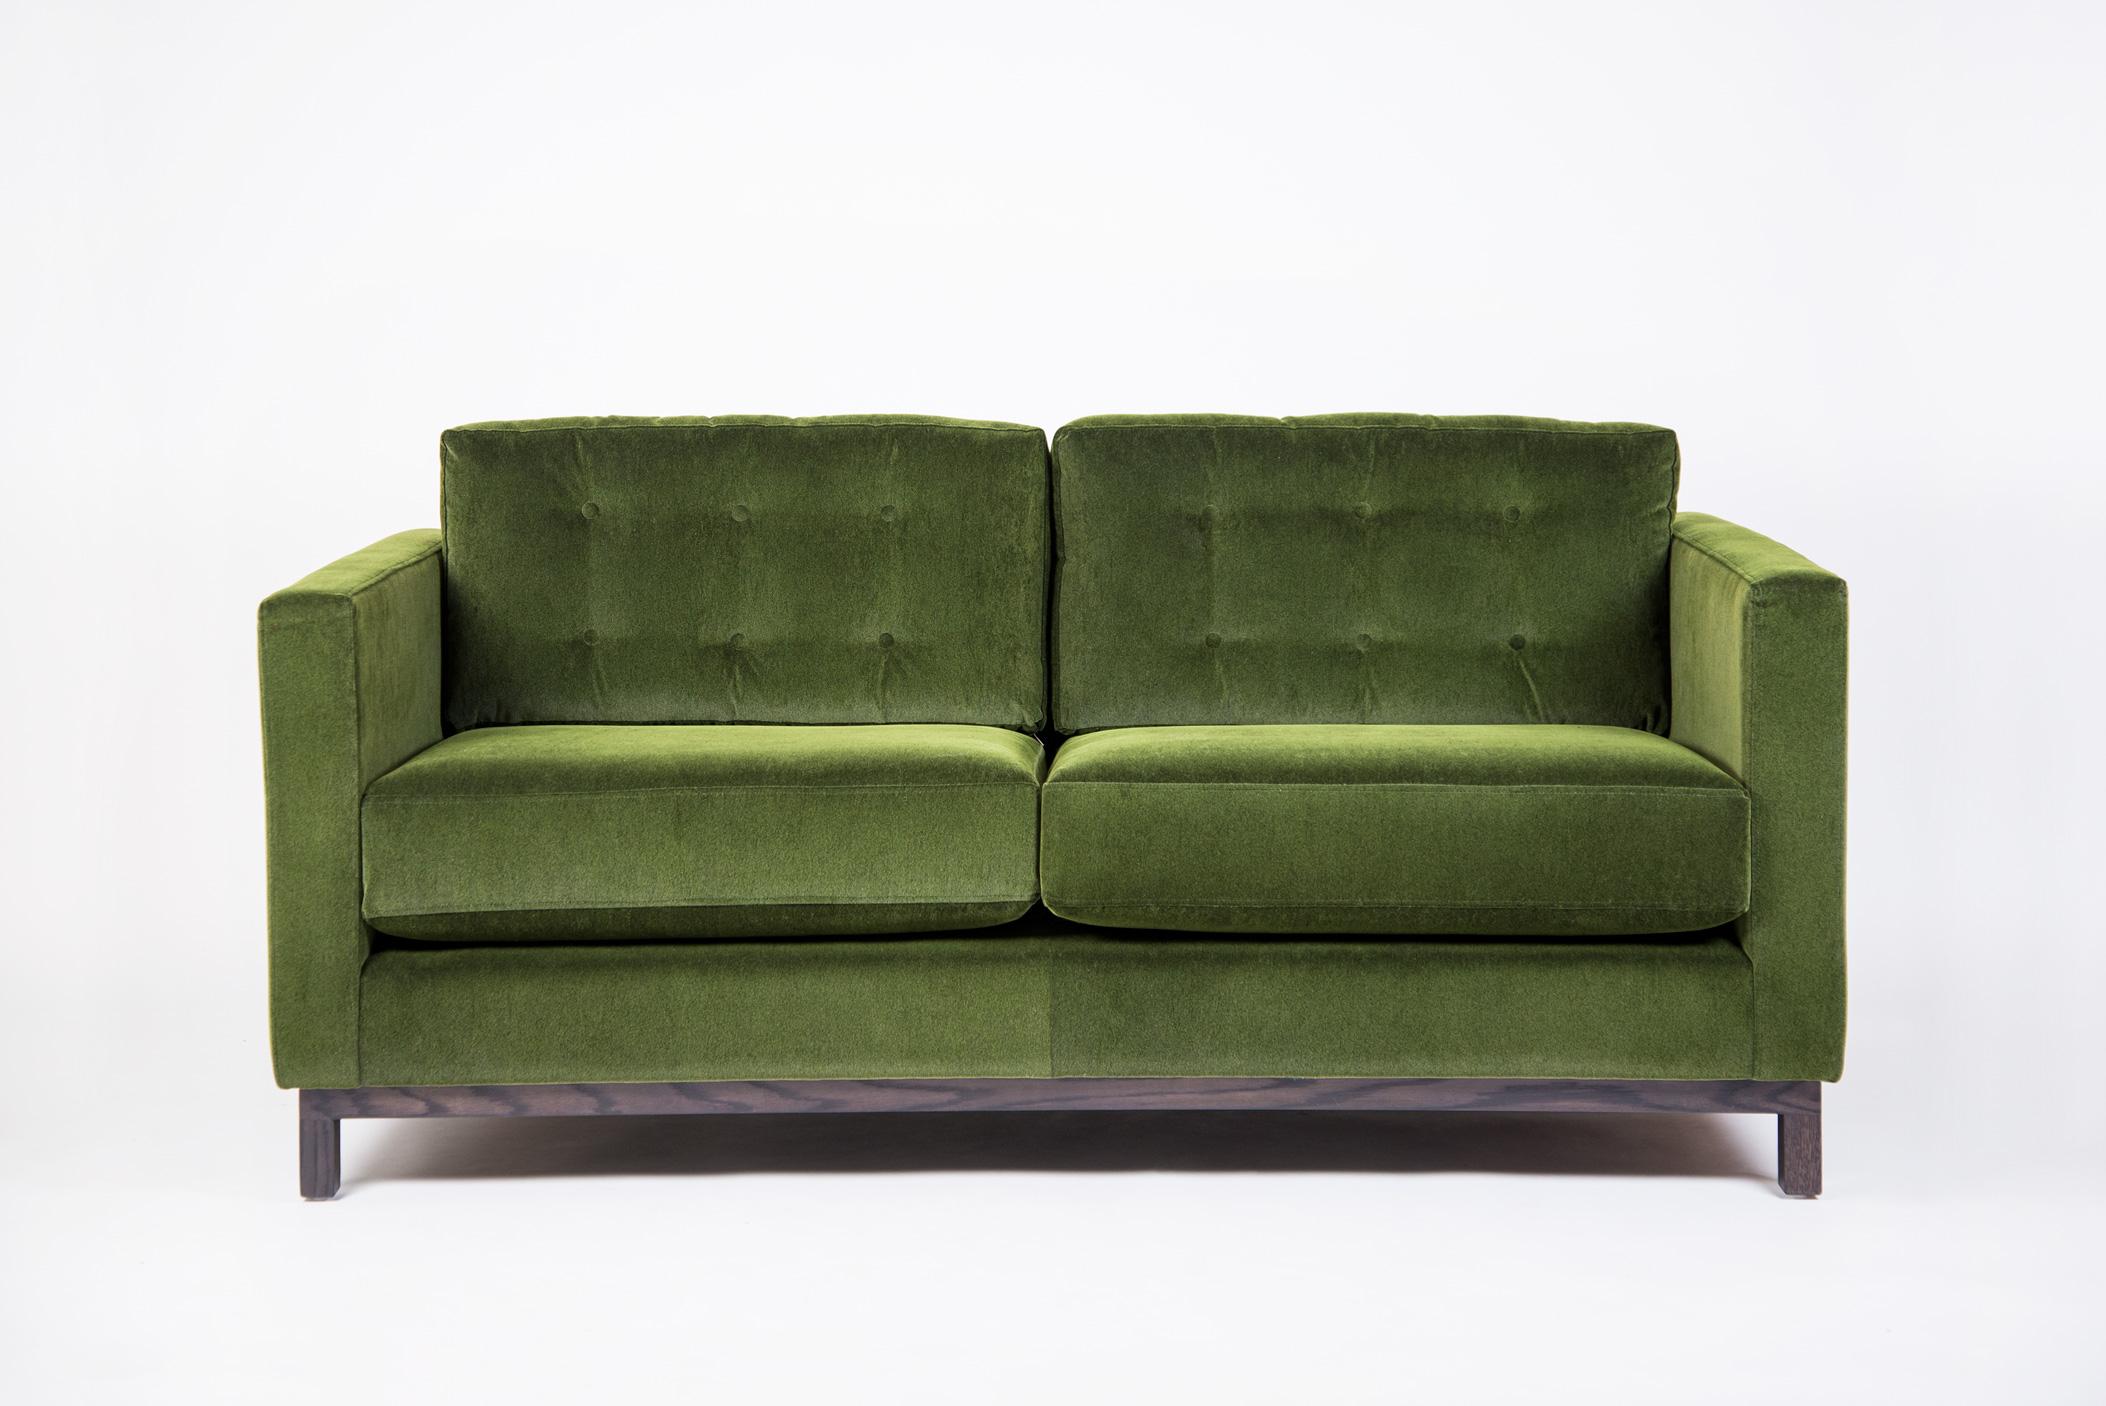 Disneys-Sofa.jpg